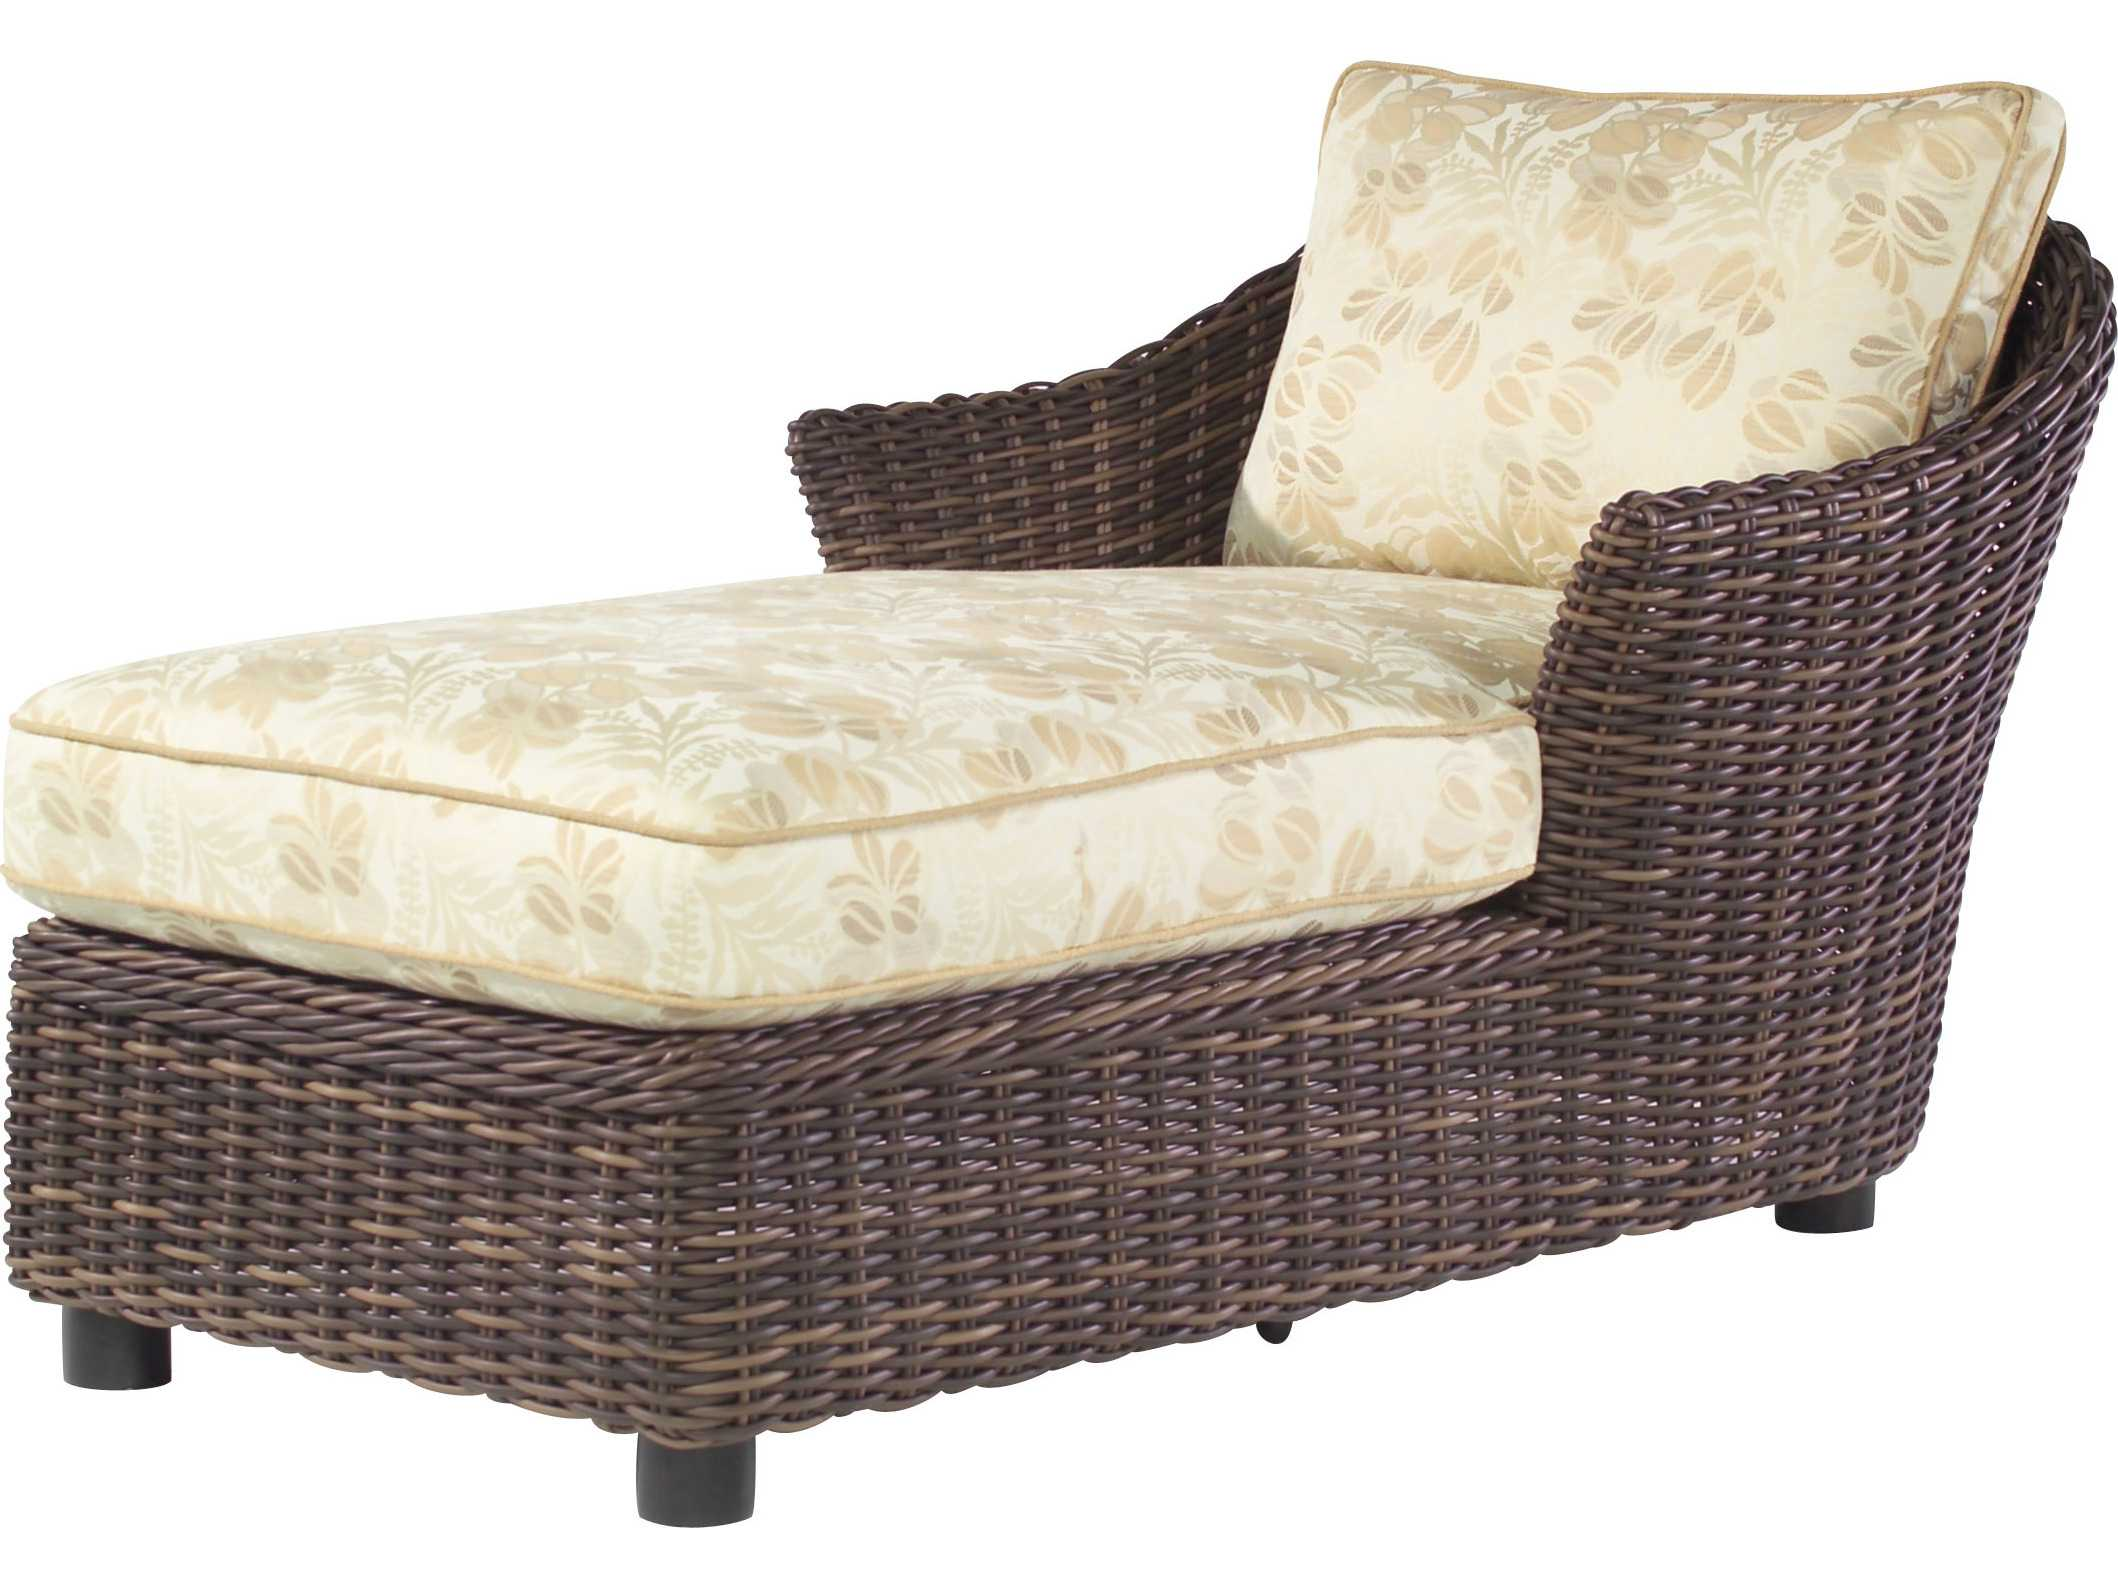 Whitecraft sonoma wicker 2 piece conversation cushion lounge set snmls2 - Conversation set replacement cushions ...